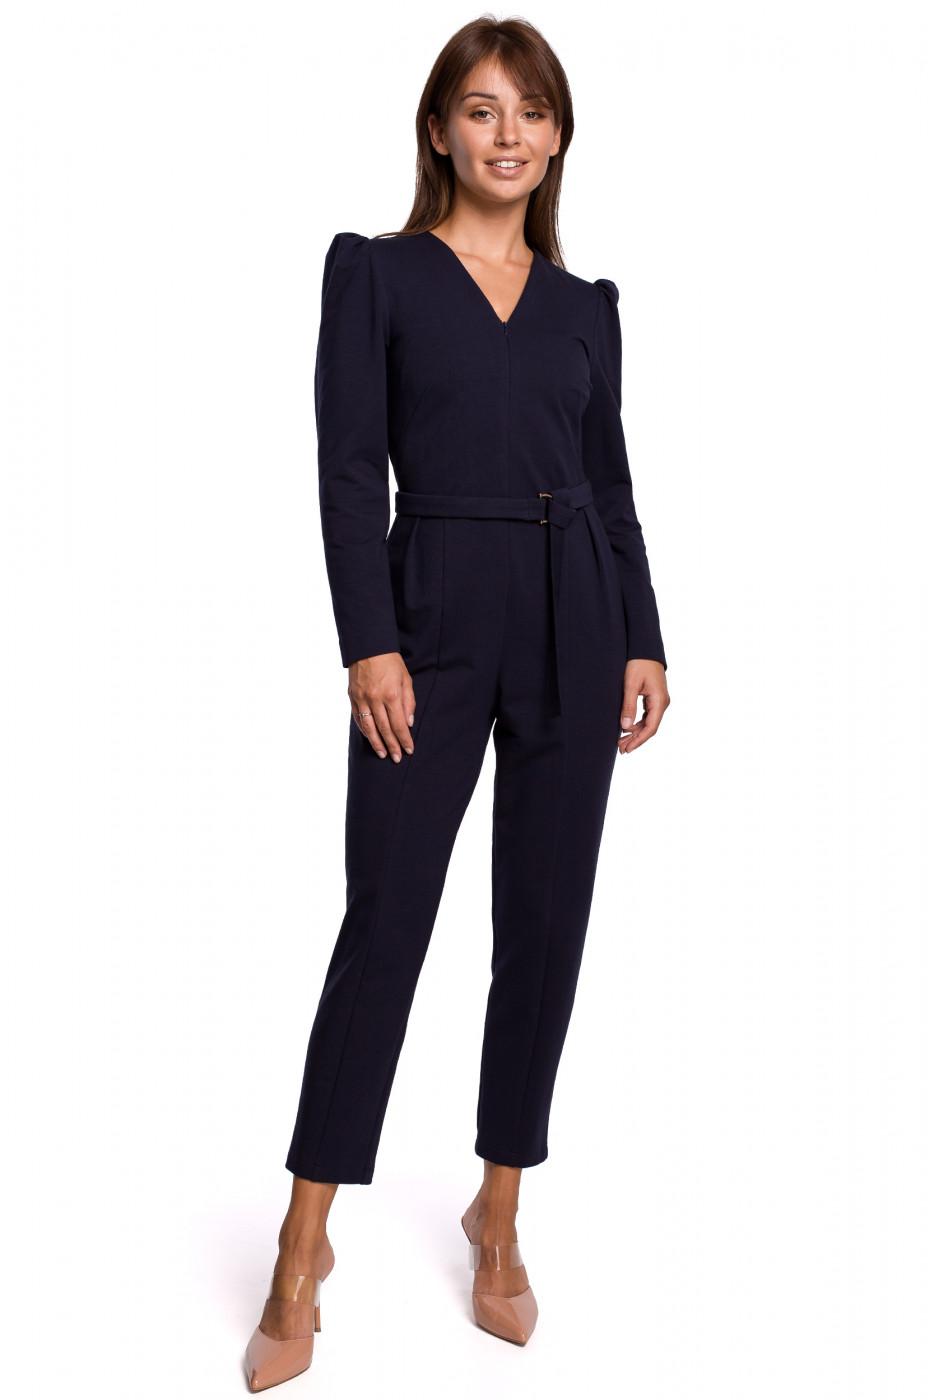 BeWear Woman's Jumpsuit B160 Navy Blue